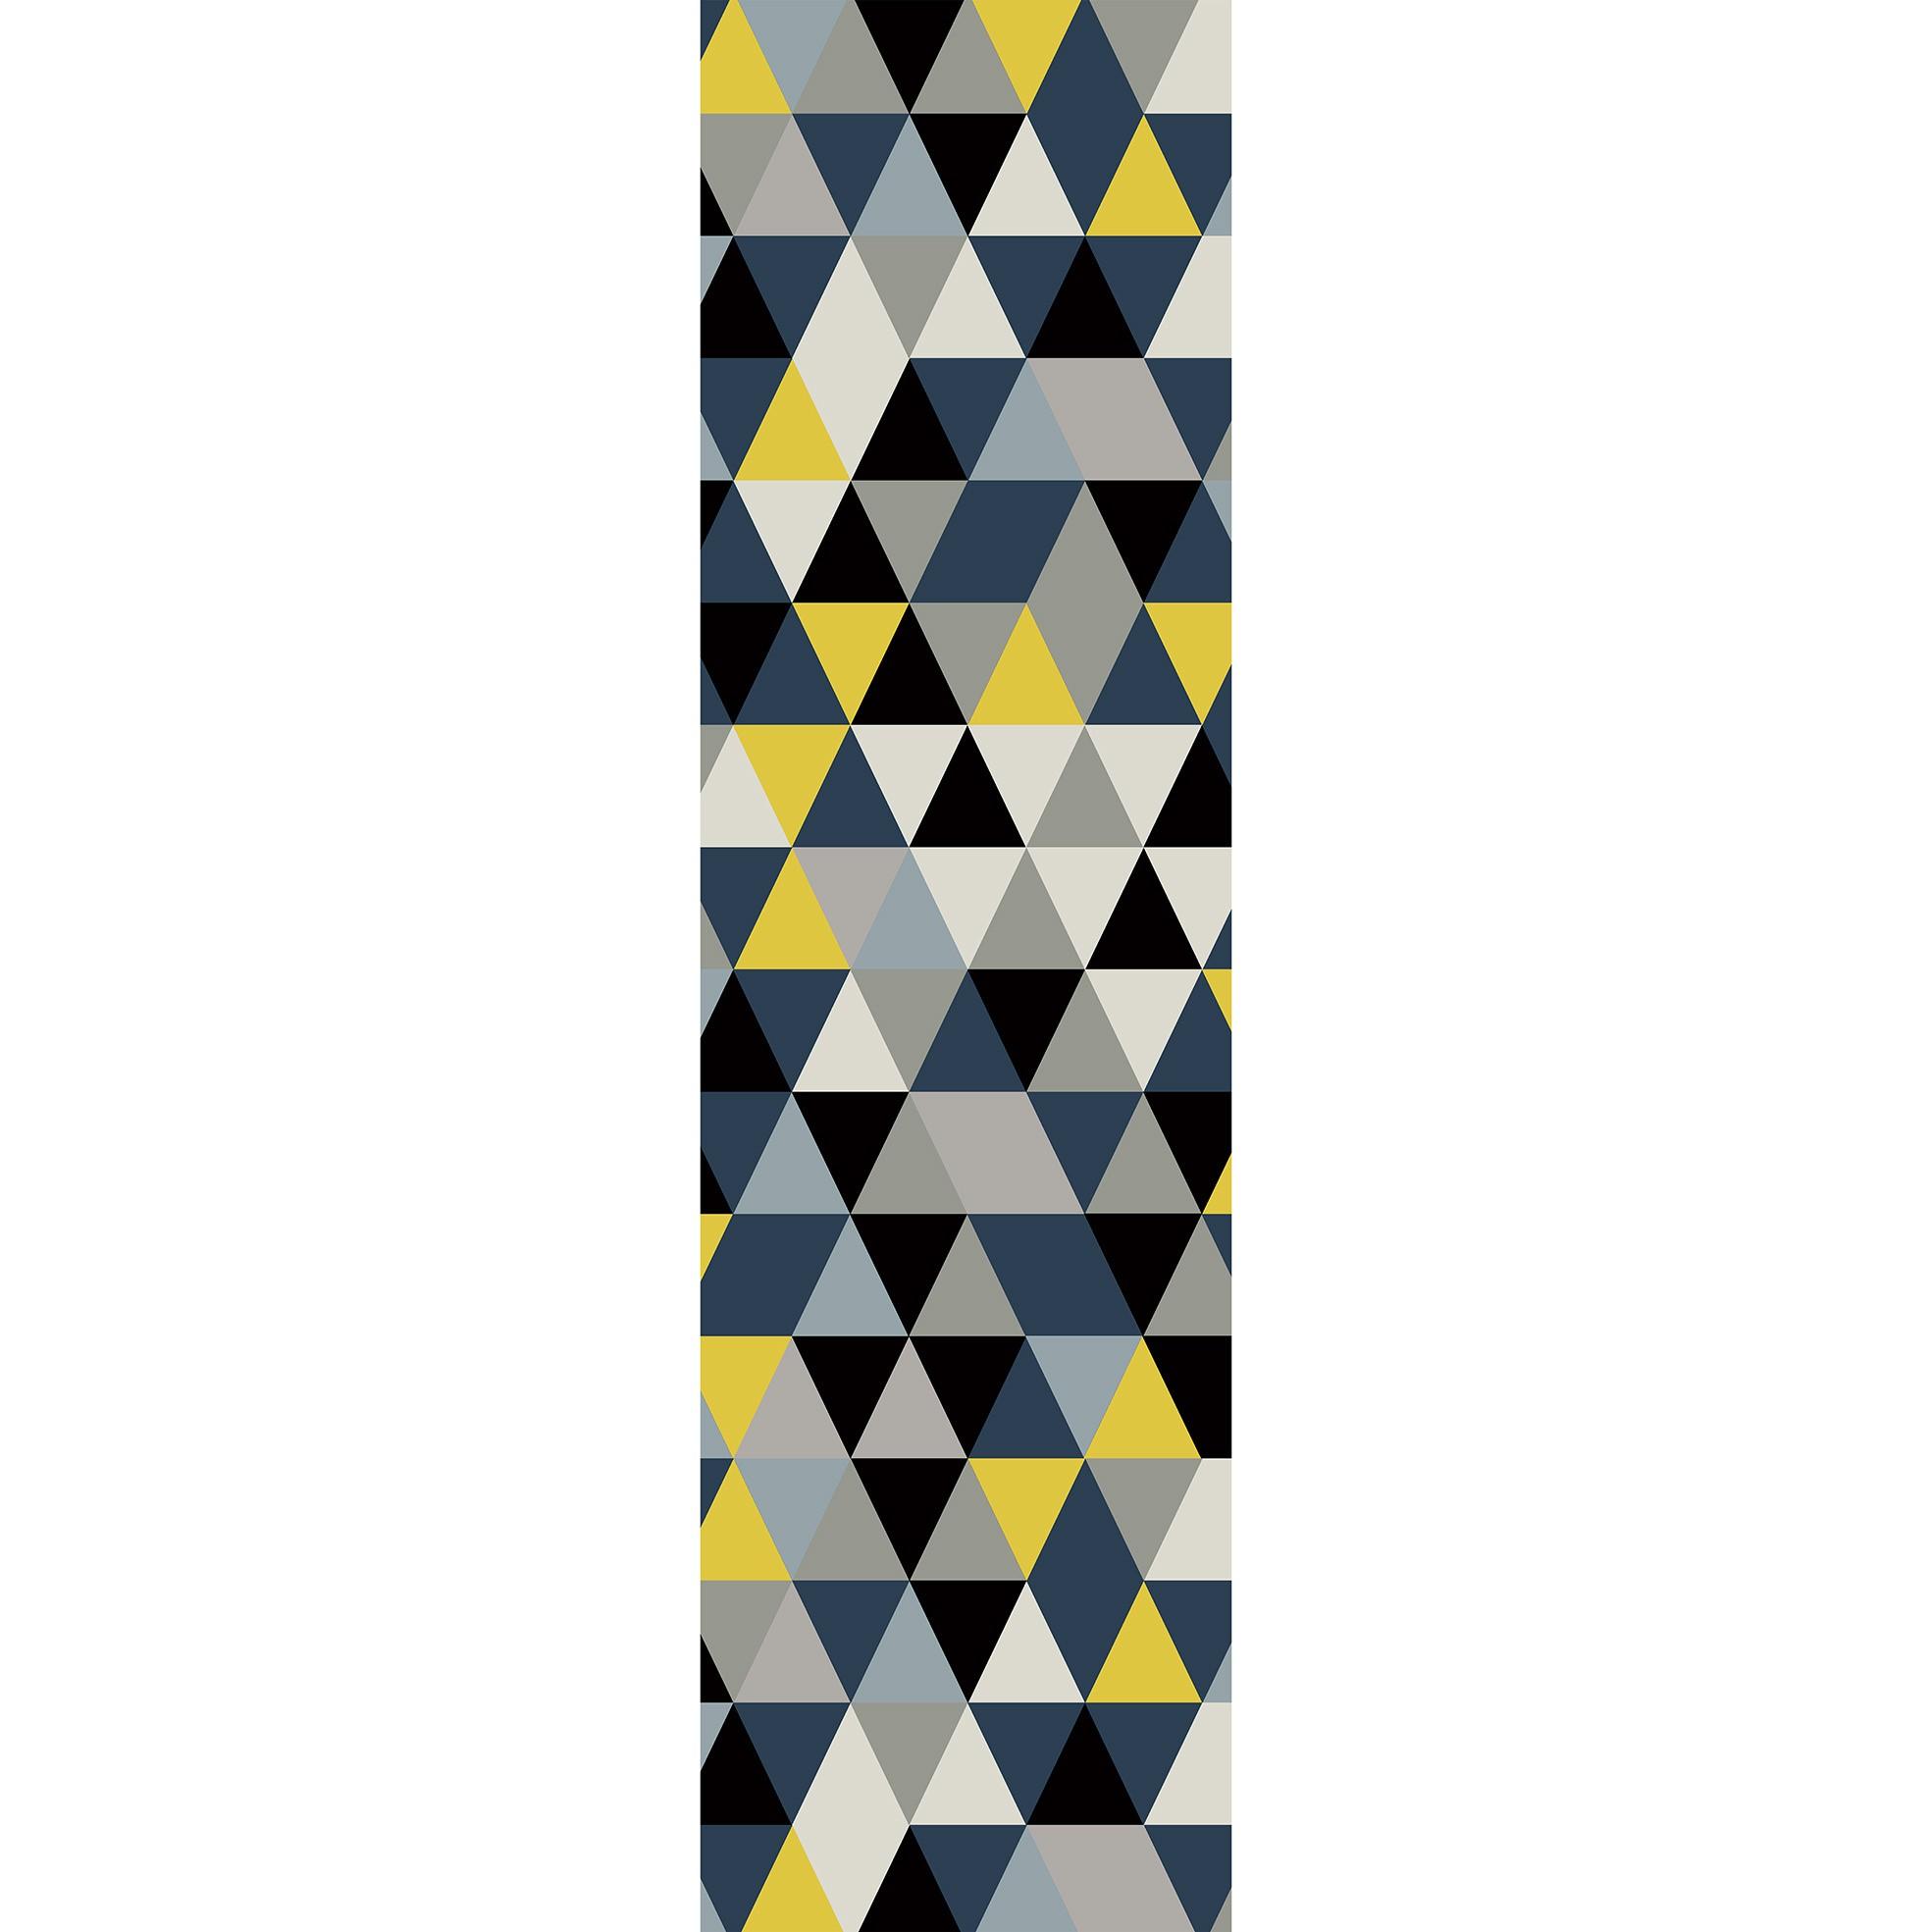 Passadeira Blue Triangule - 66 x 240 cm